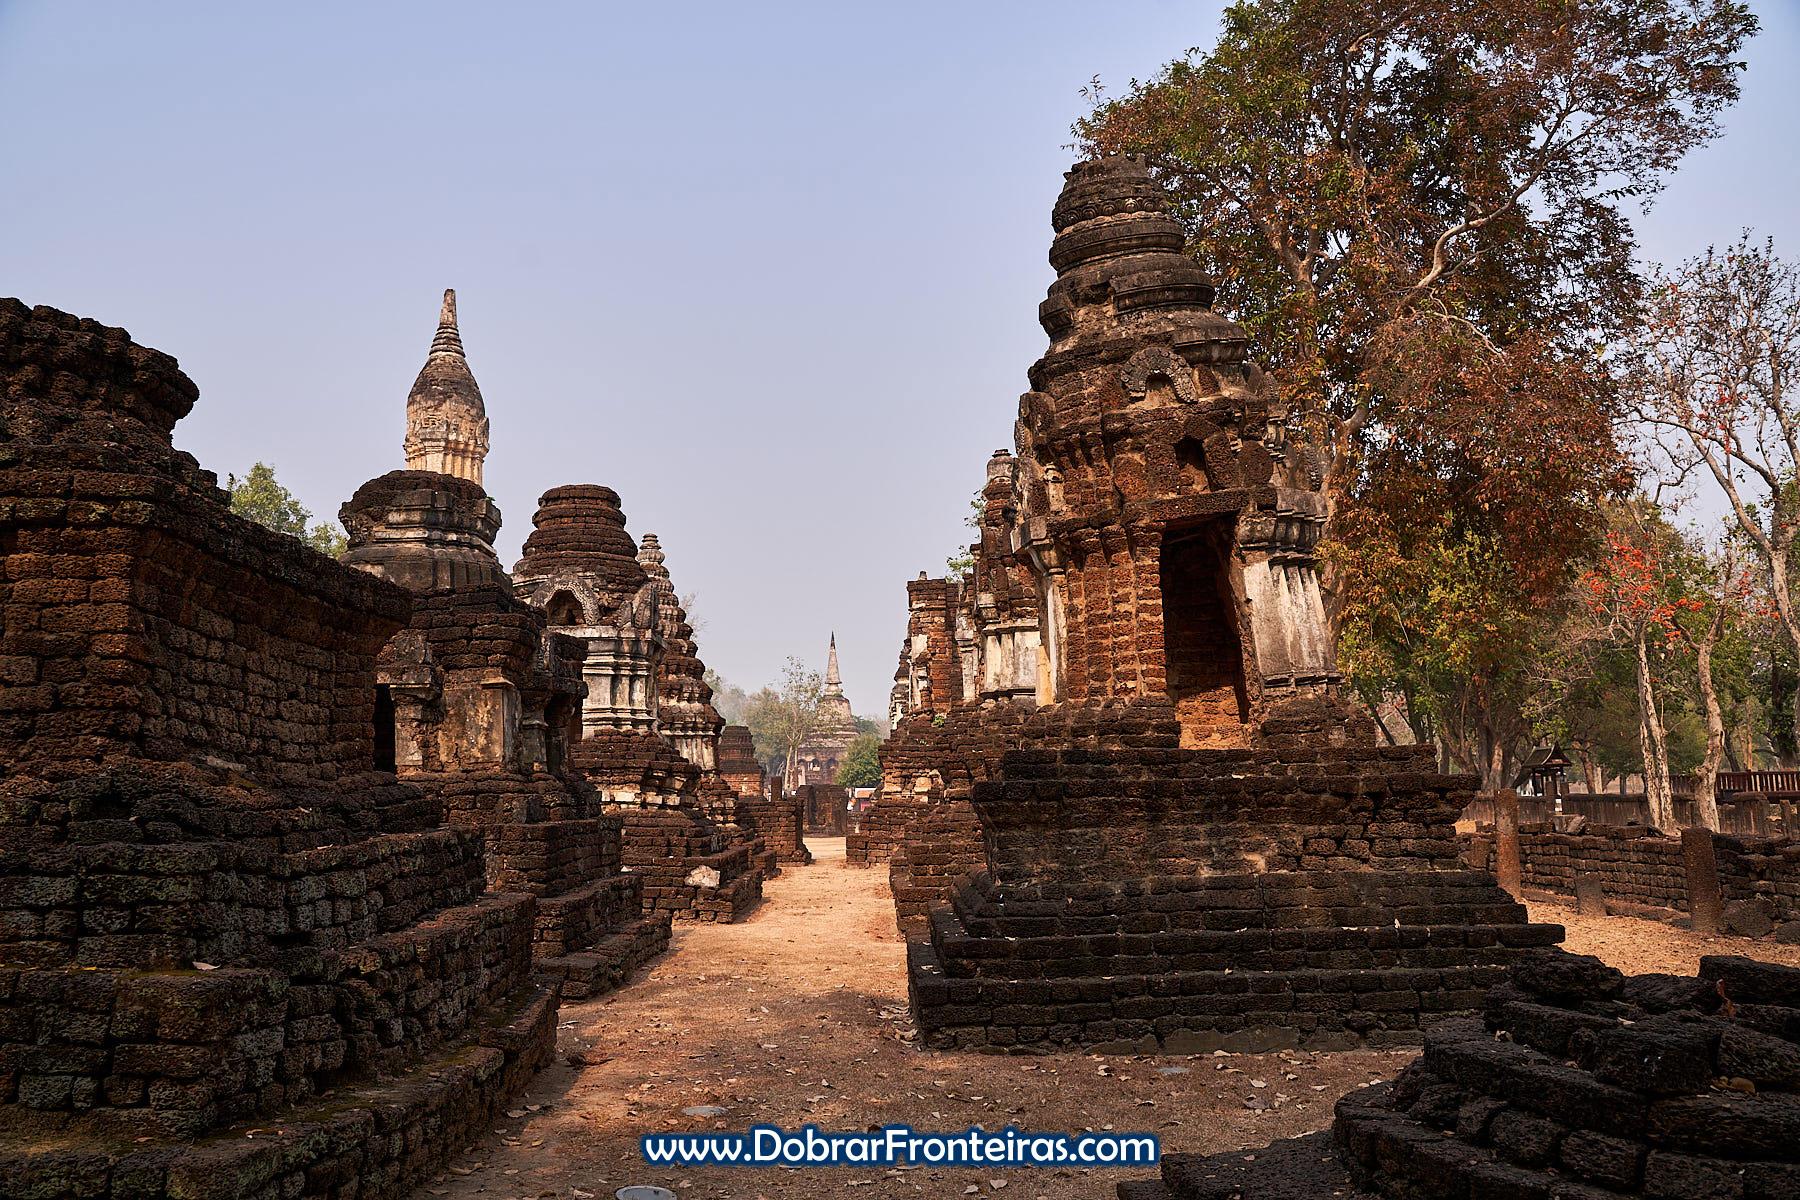 Estupas budistas de vários estilos no Wat Chedi Chet Thaeo